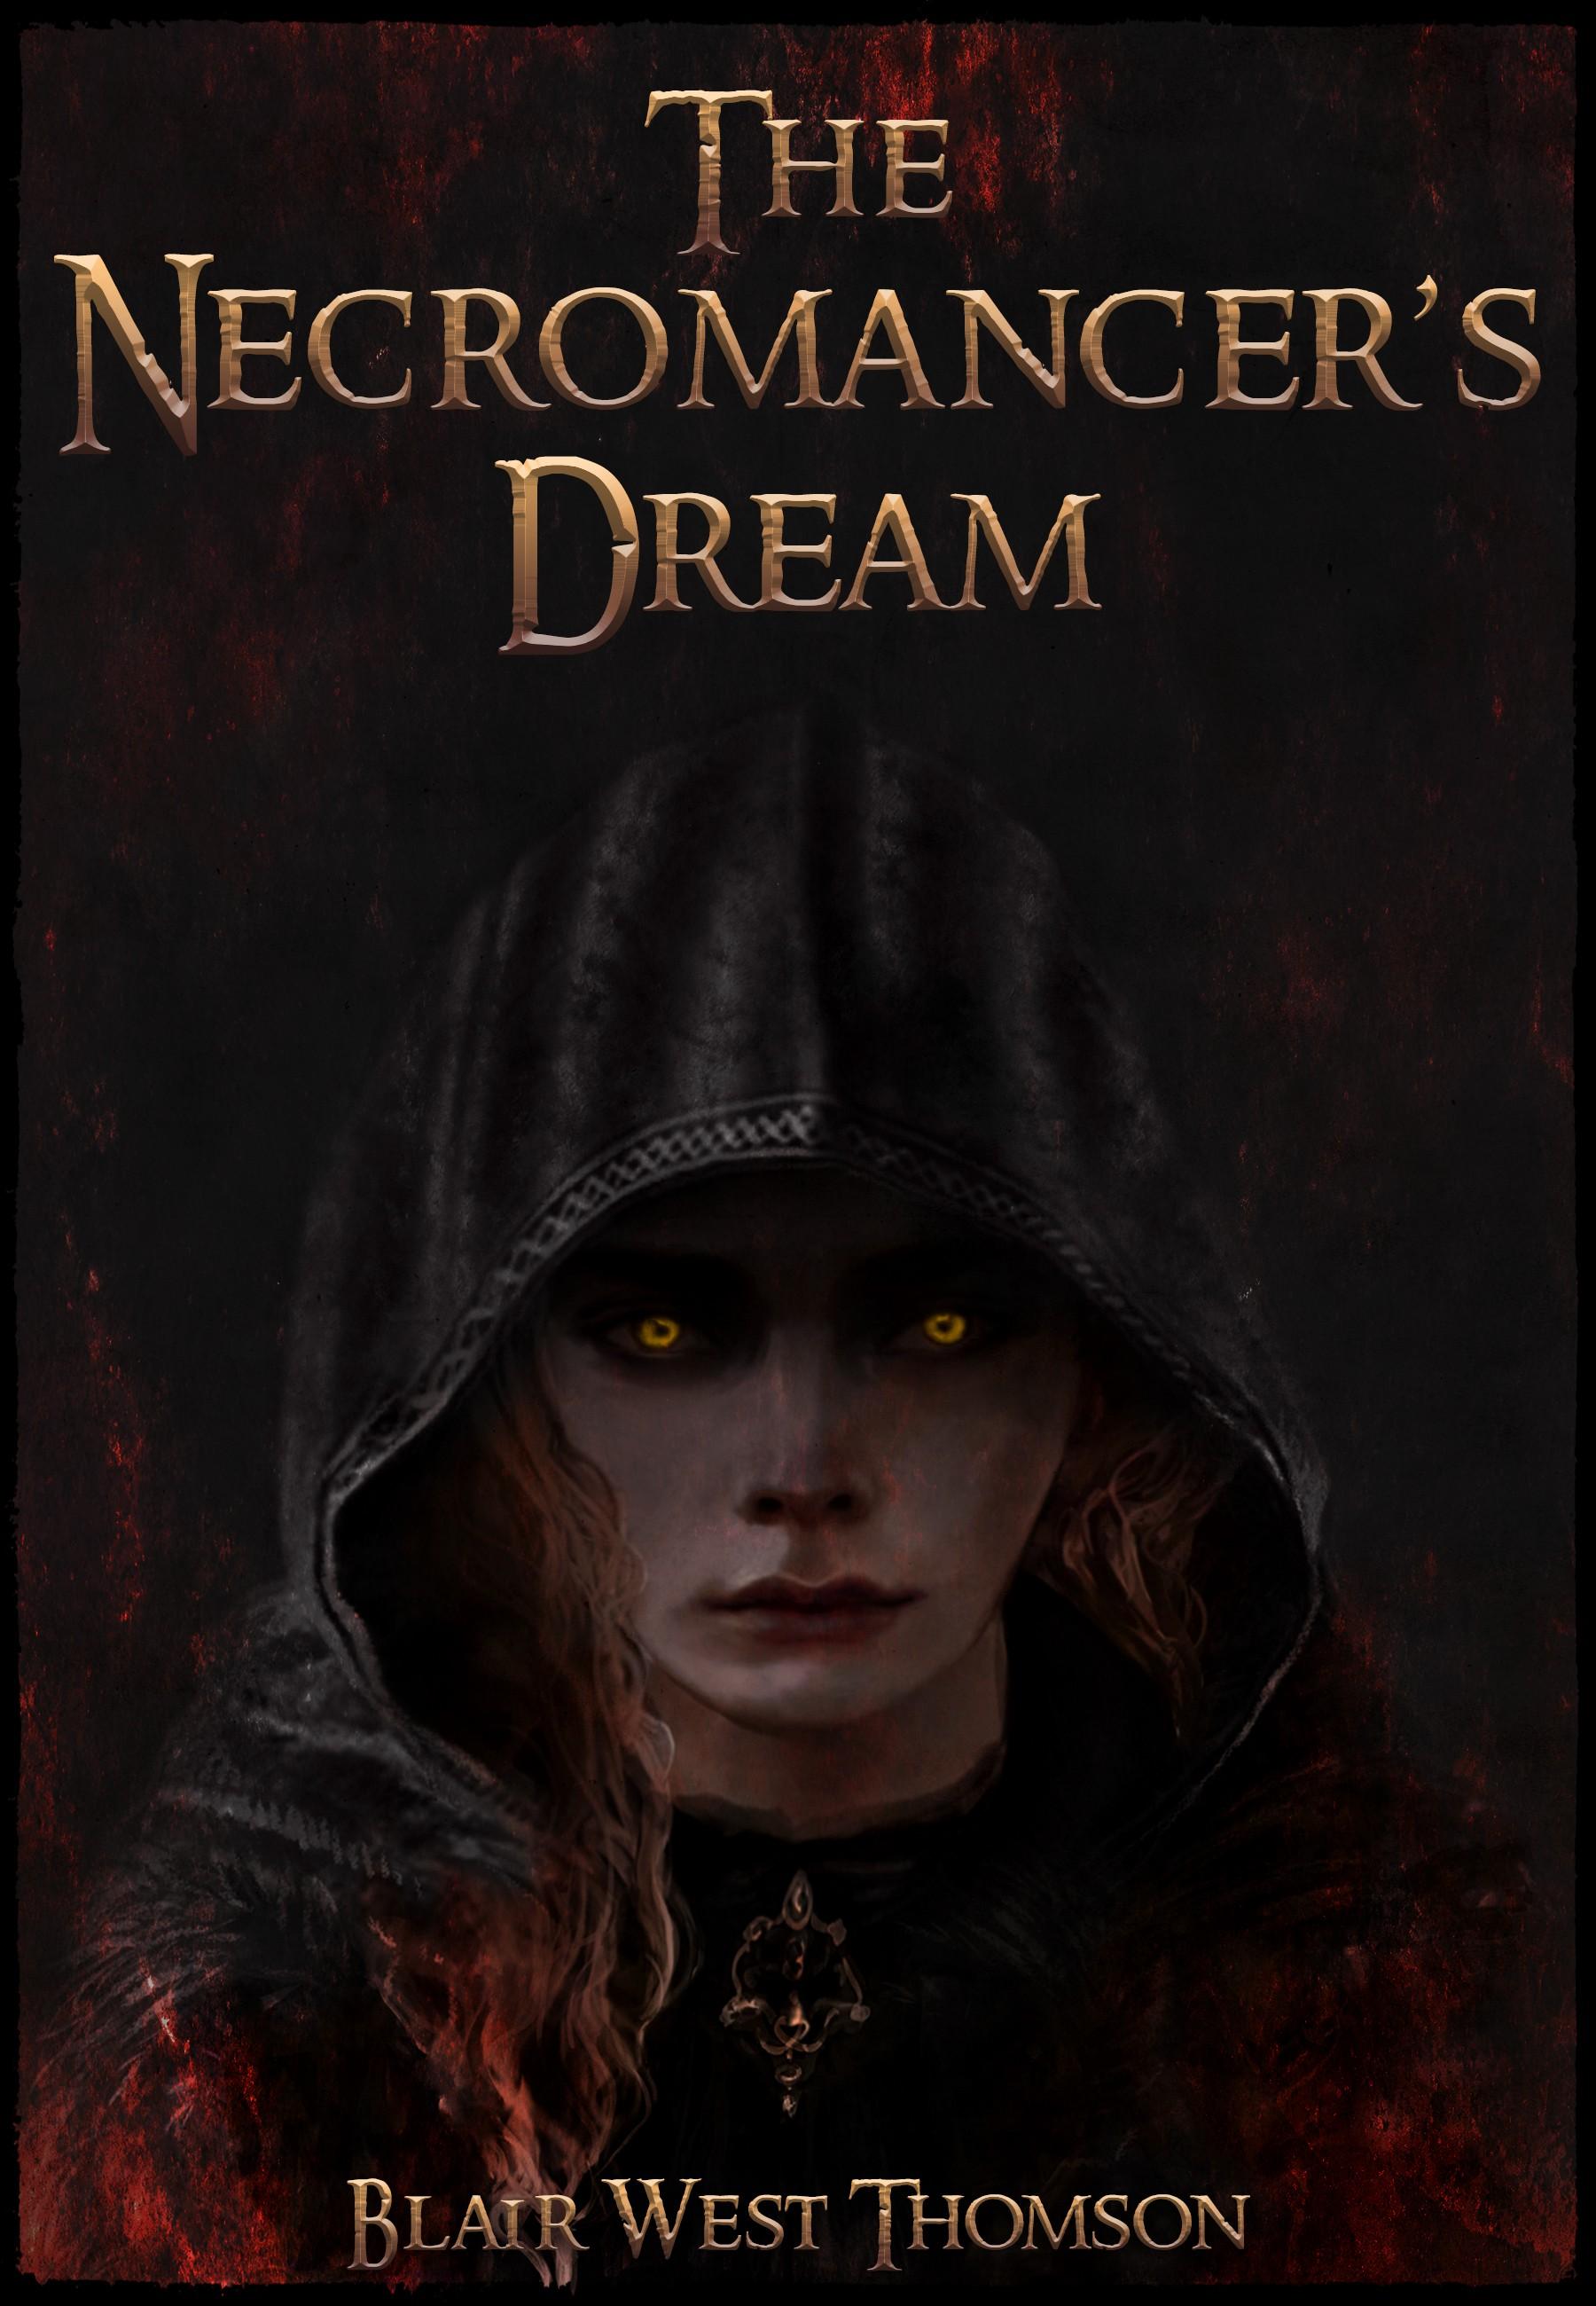 Book cover: Necromancer's Dream Ebook and paperback